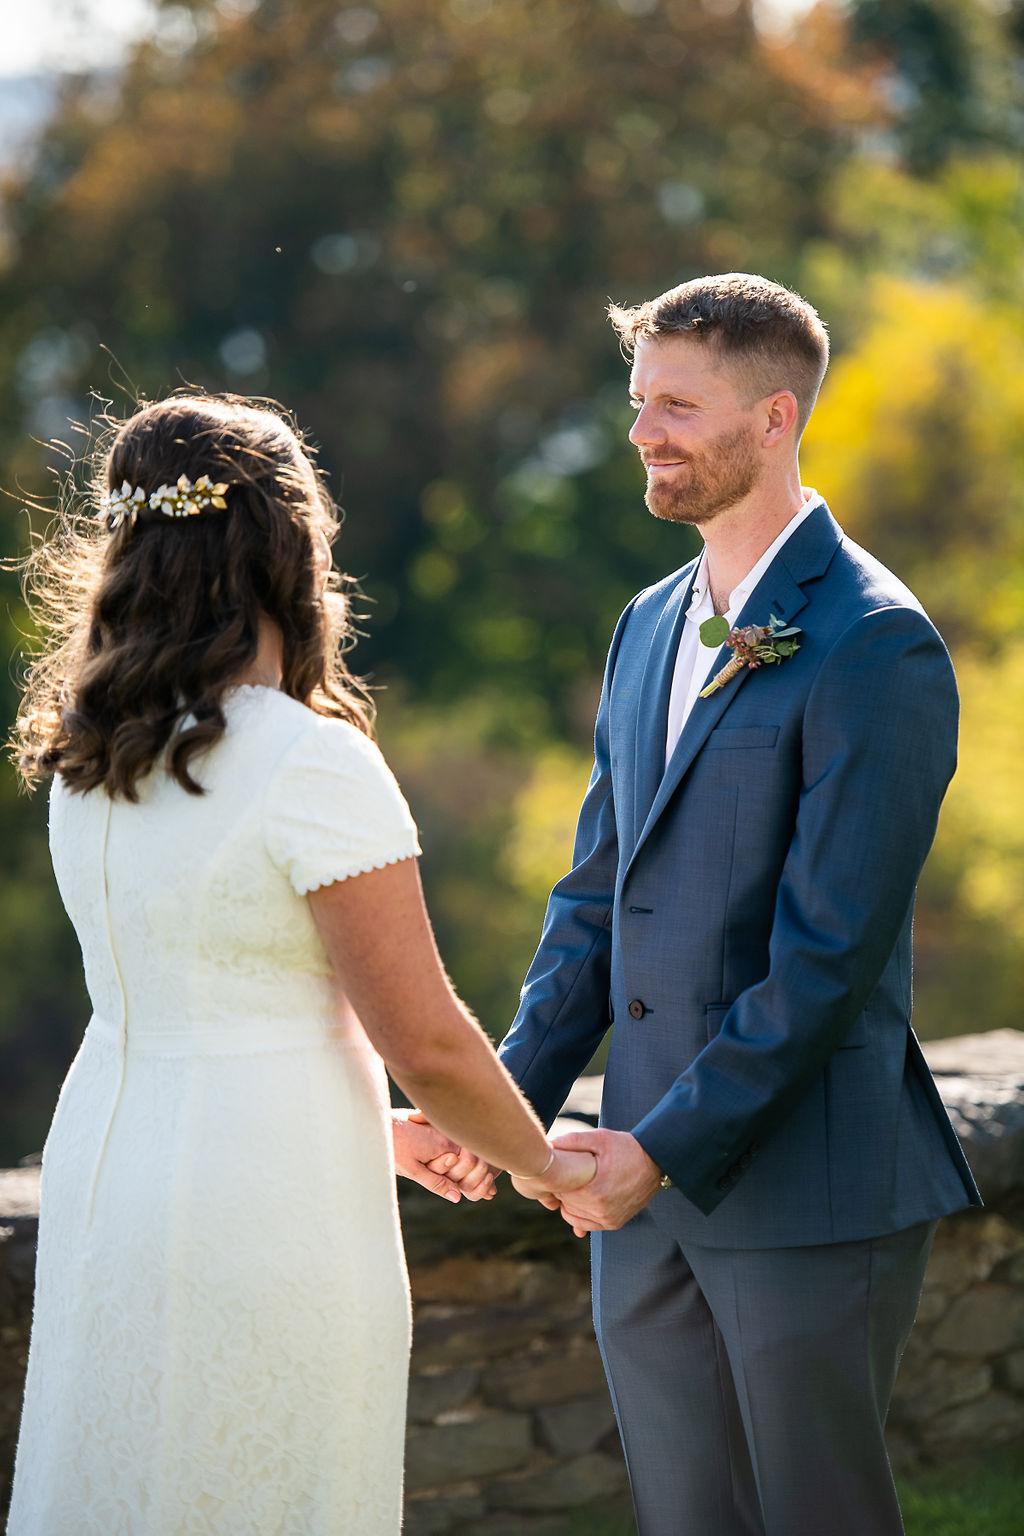 Fall Seranak Wedding Portraits at Tanglewood; Photos by Christopher Duggan